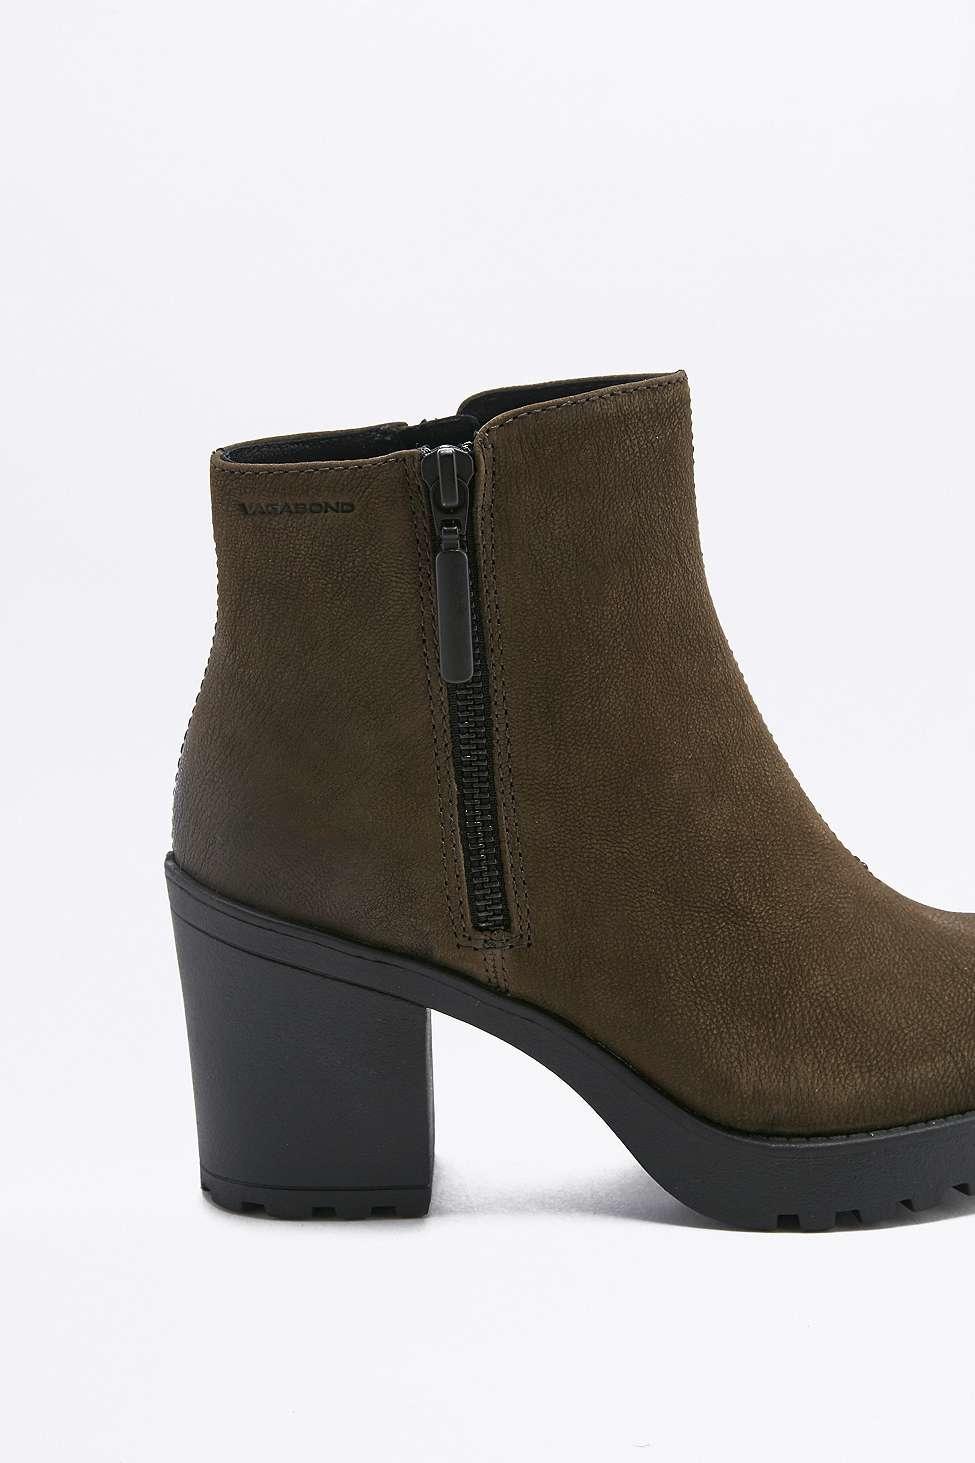 Vagabond Grace Green Side Zip Ankle Boots